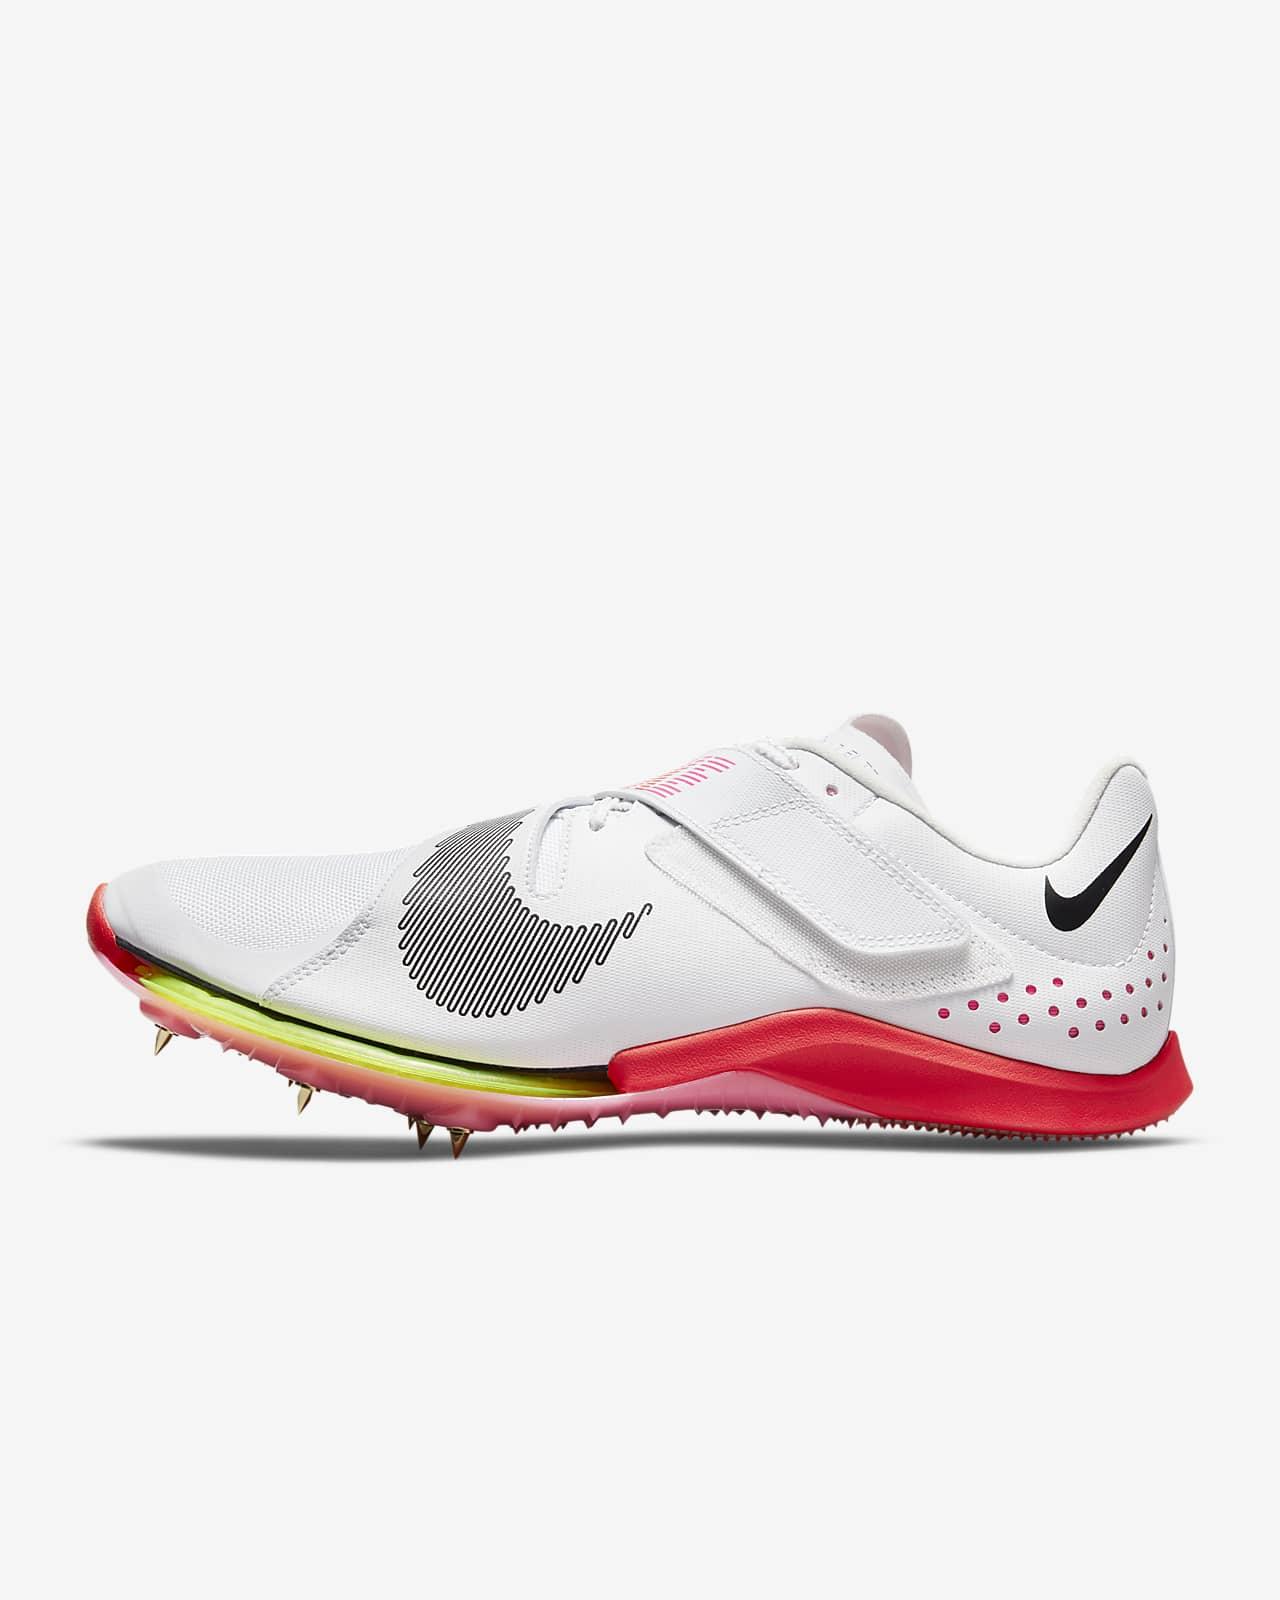 Nike Air Zoom Long Jump Elite Athletics Jumping Spikes